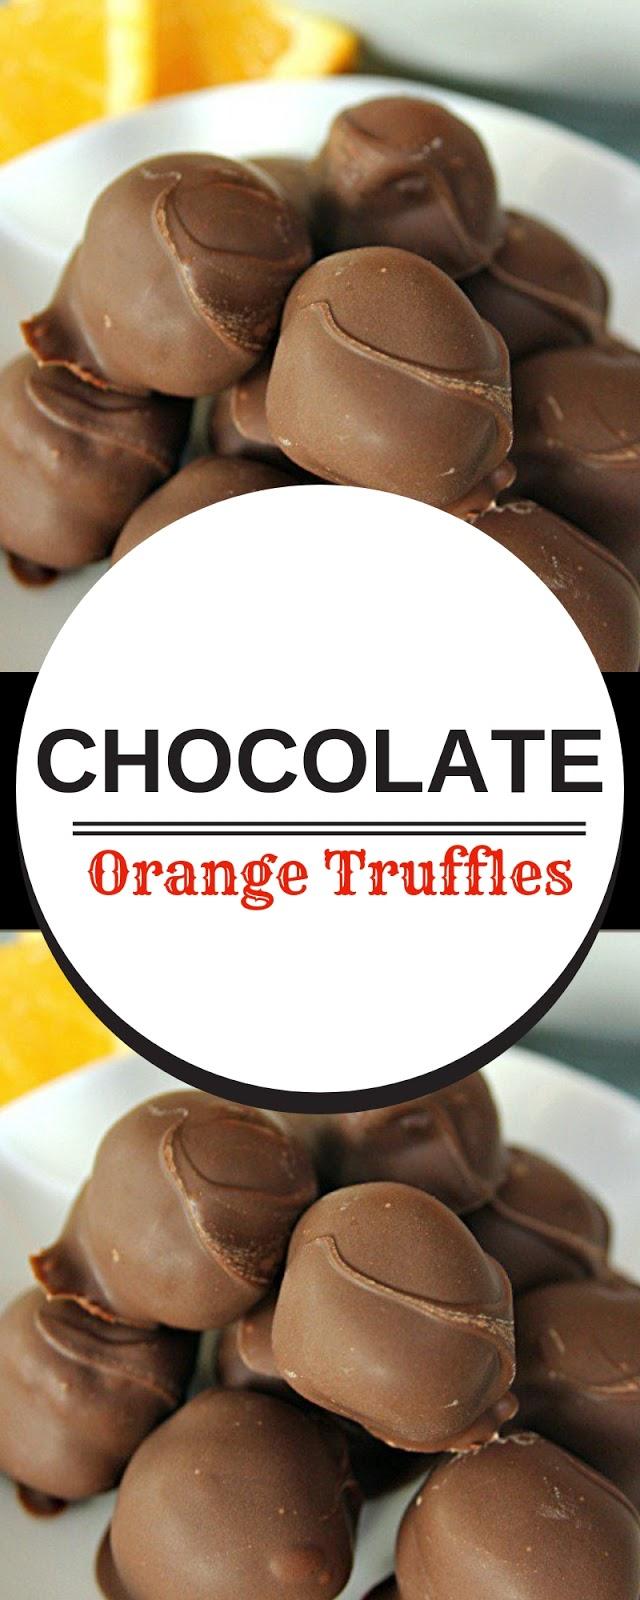 Chocolate Orange Truffles #christmas #chocolate